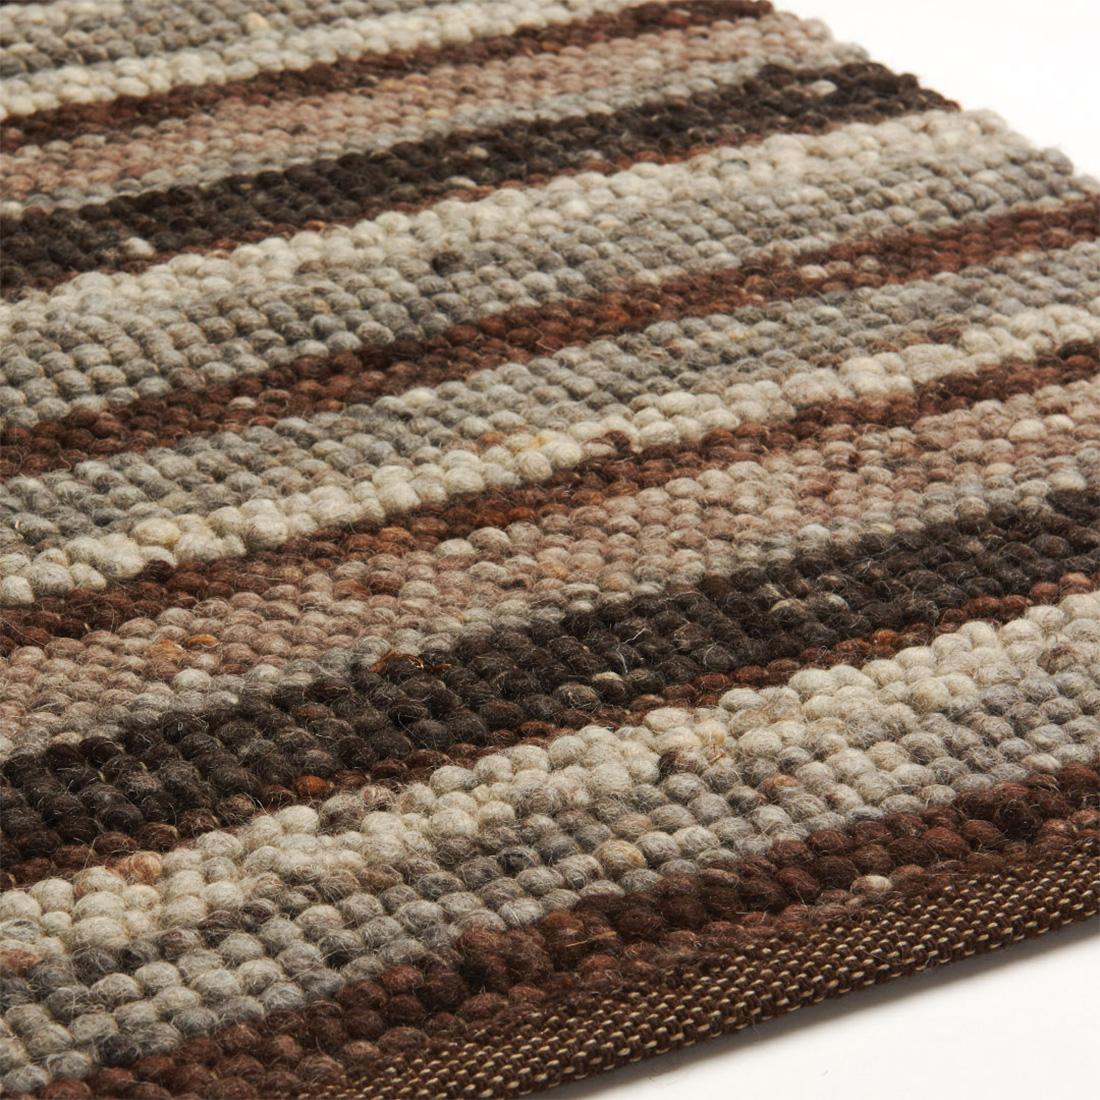 Vloerkleed Brinker Greenland Stripes 1042 | 240 x 340 cm